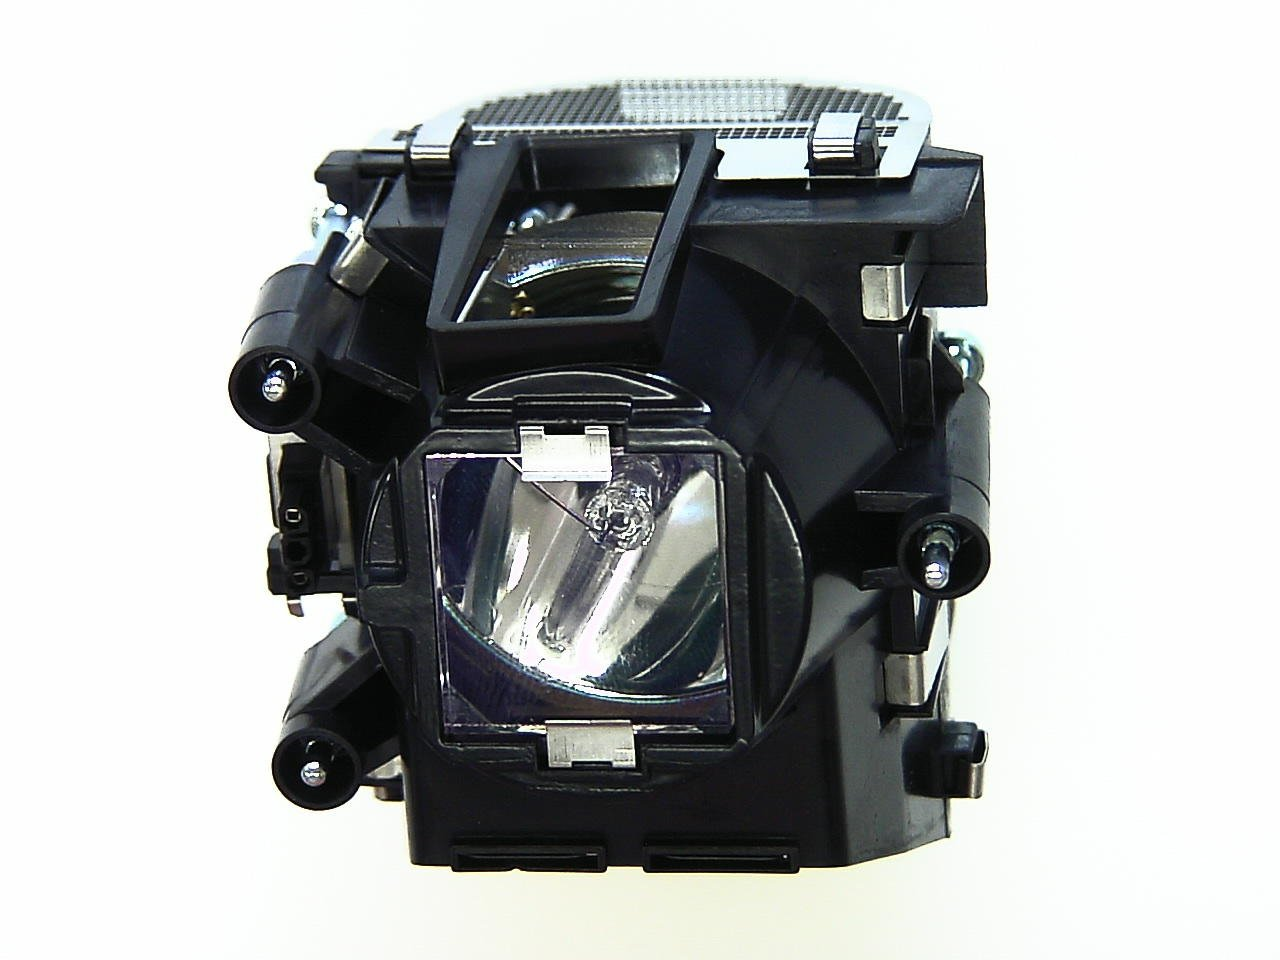 V7 VPL1218-1N Lamp for select Christie projectors